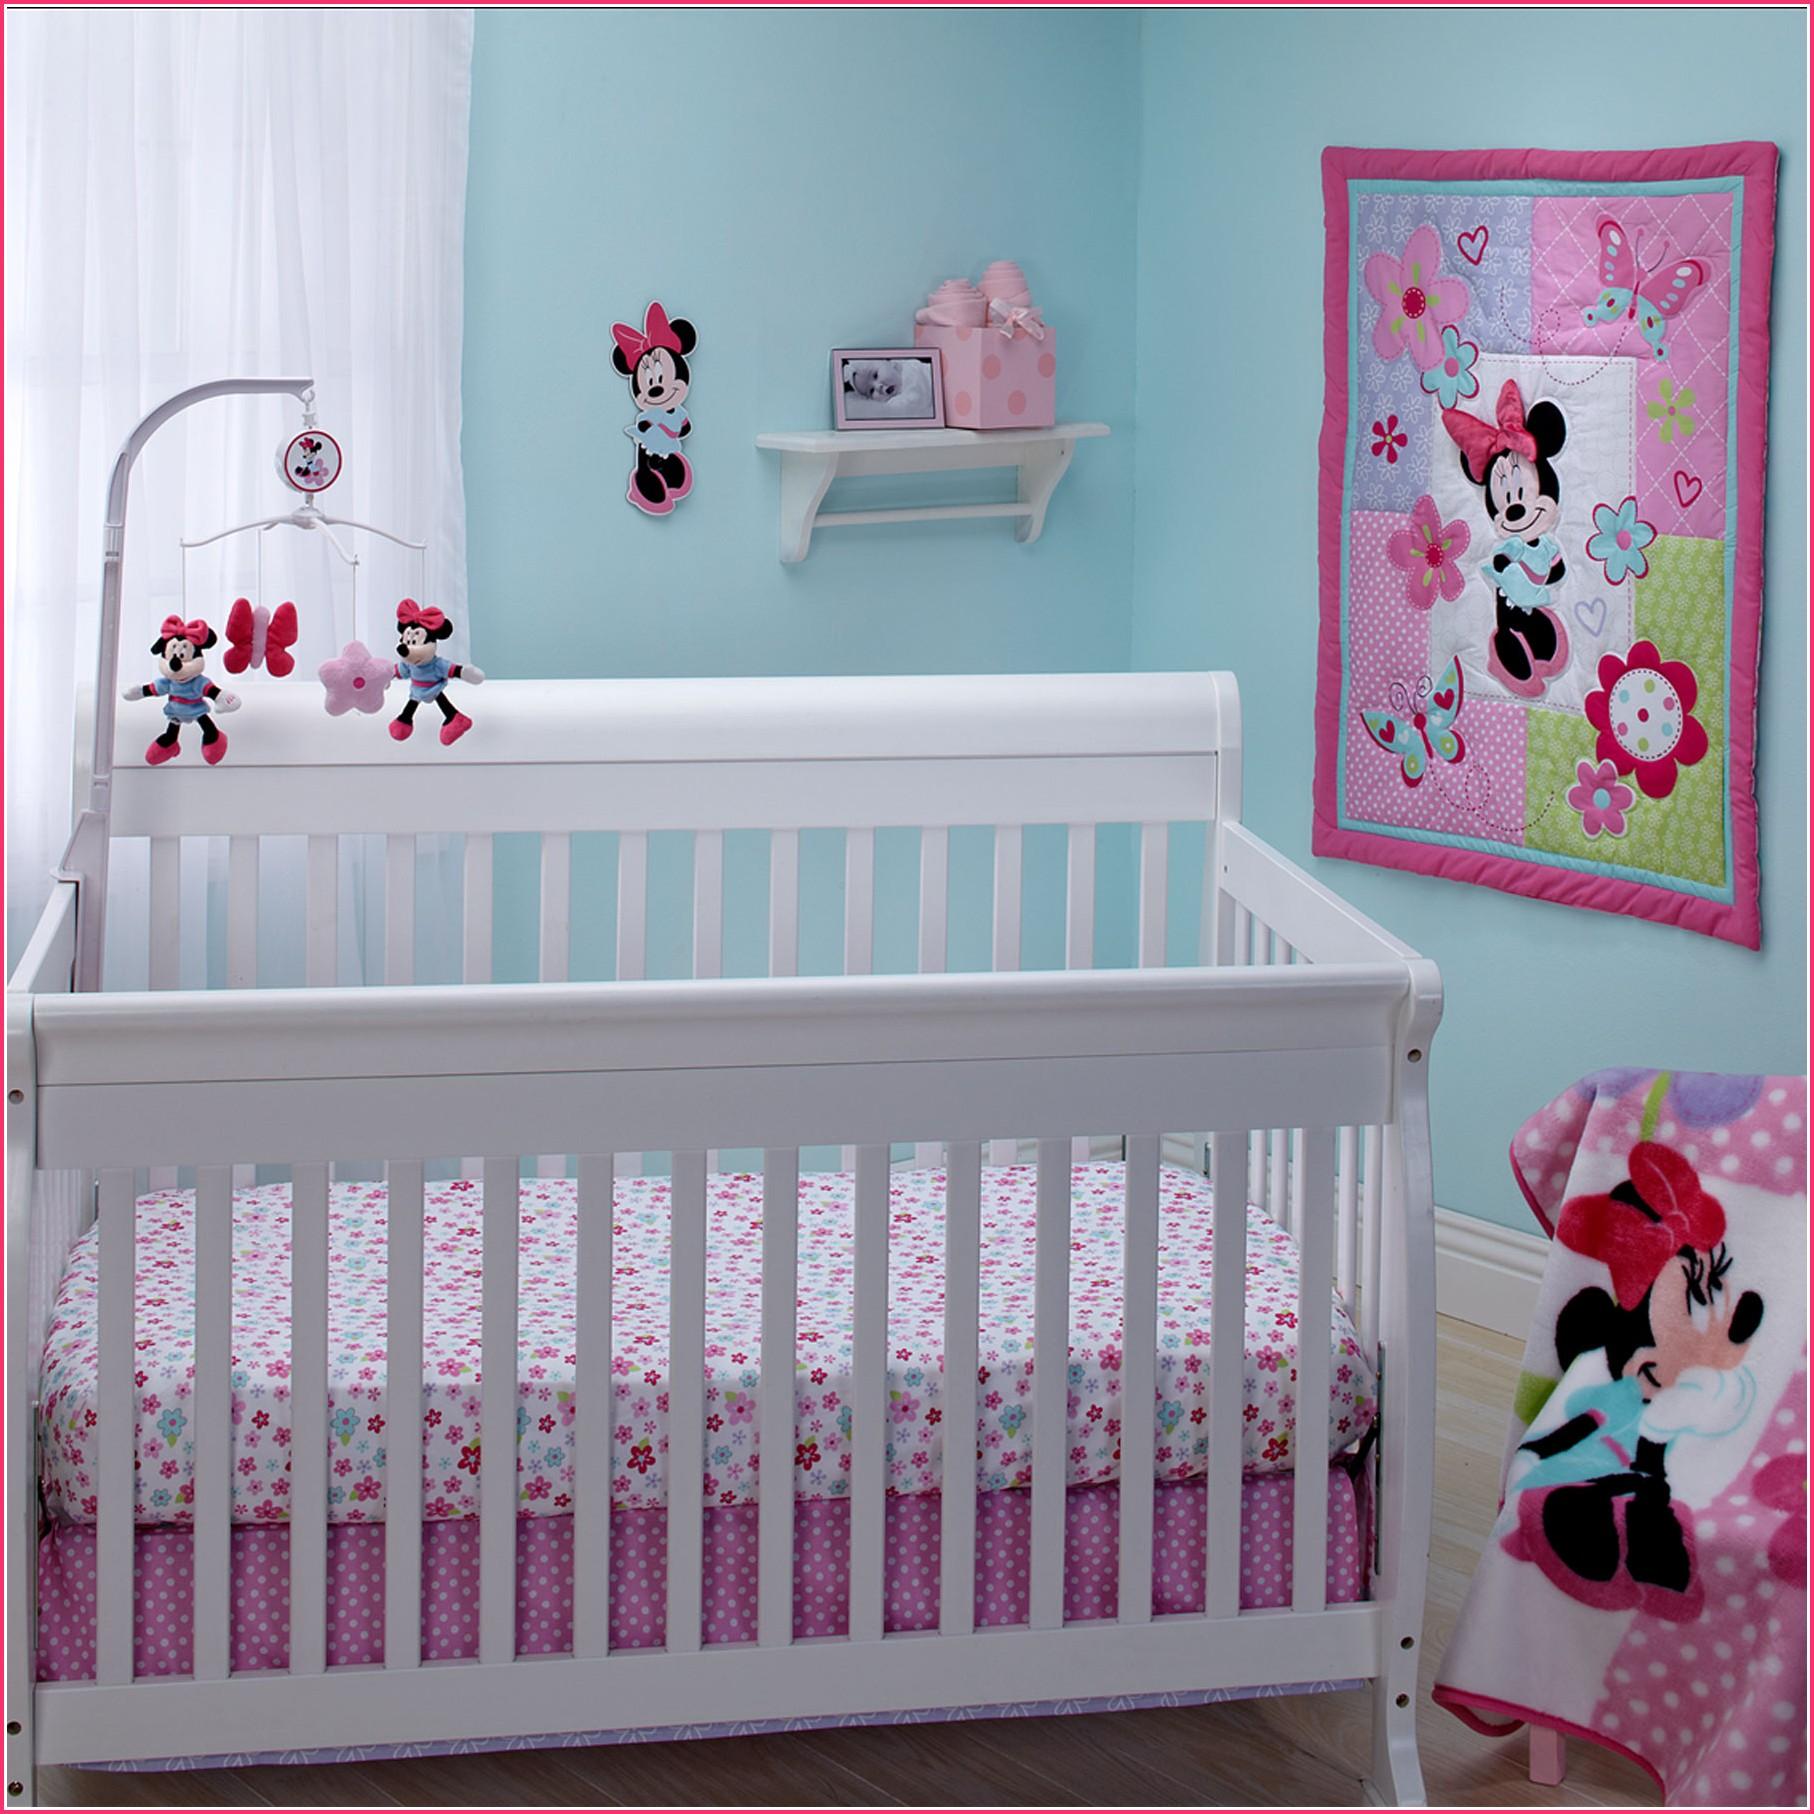 Baby Crib Mattress Decor Ideas